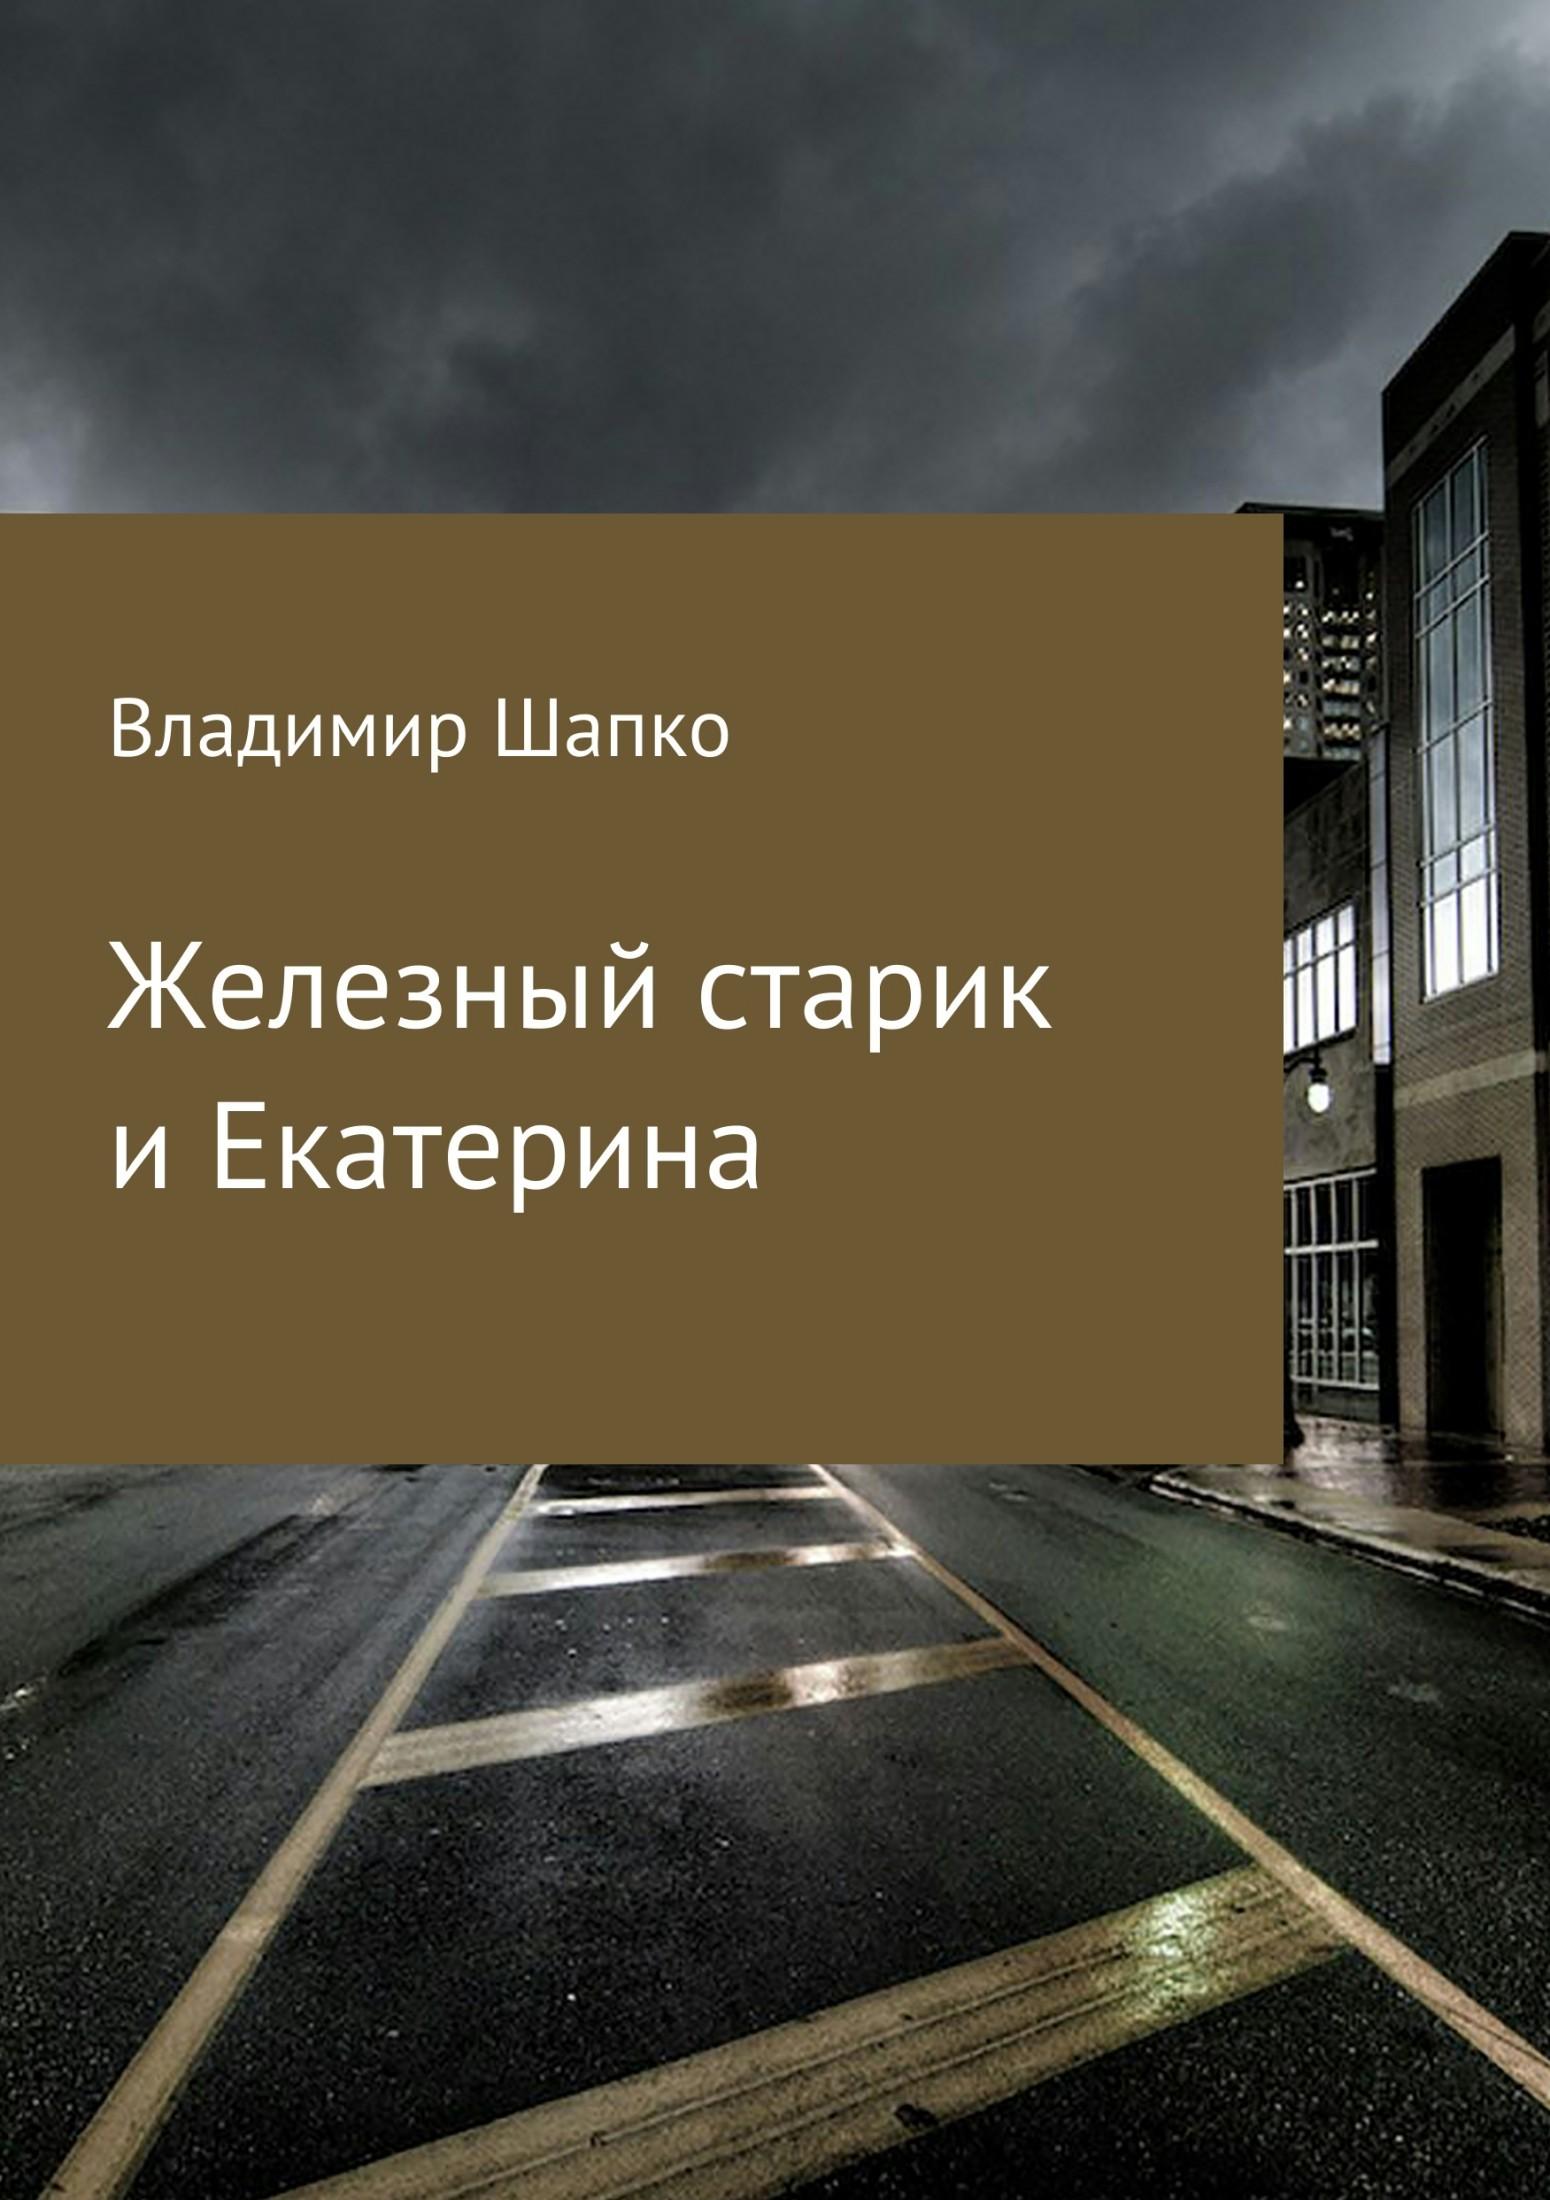 Владимир Макарович Шапко Железный старик и Екатерина